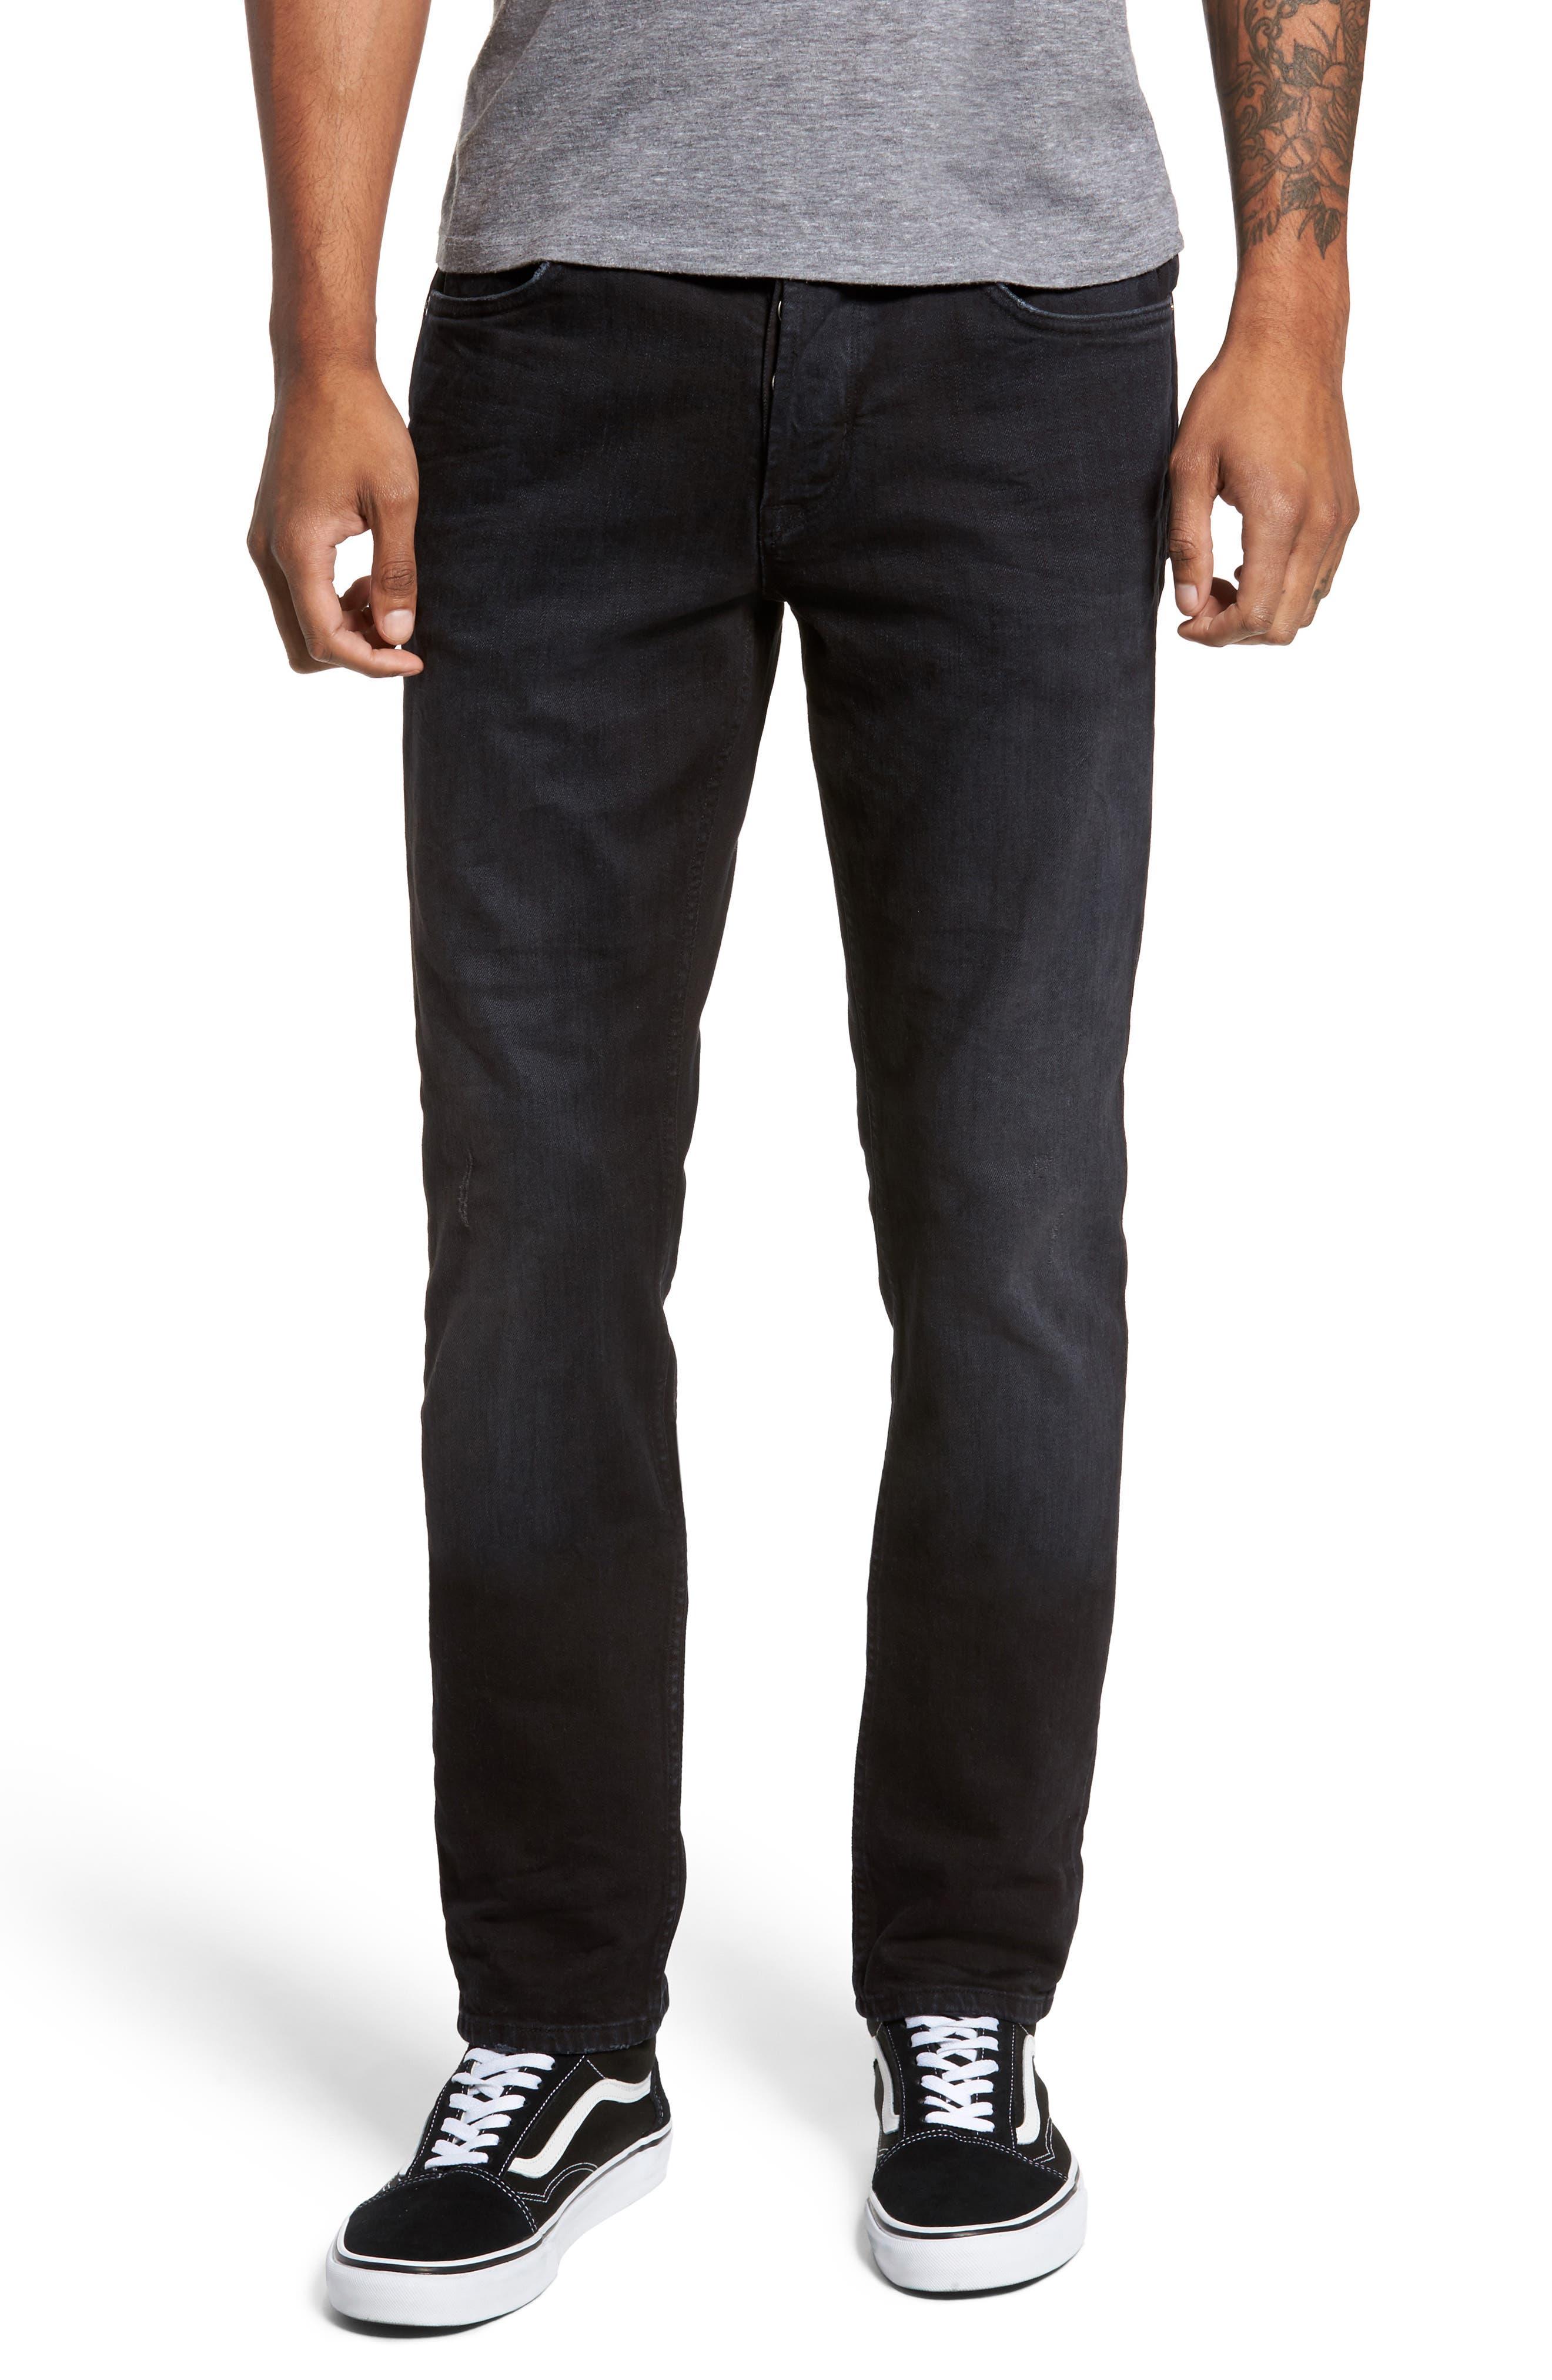 Sartor Skinny Fit Jeans,                             Main thumbnail 1, color,                             Low Key